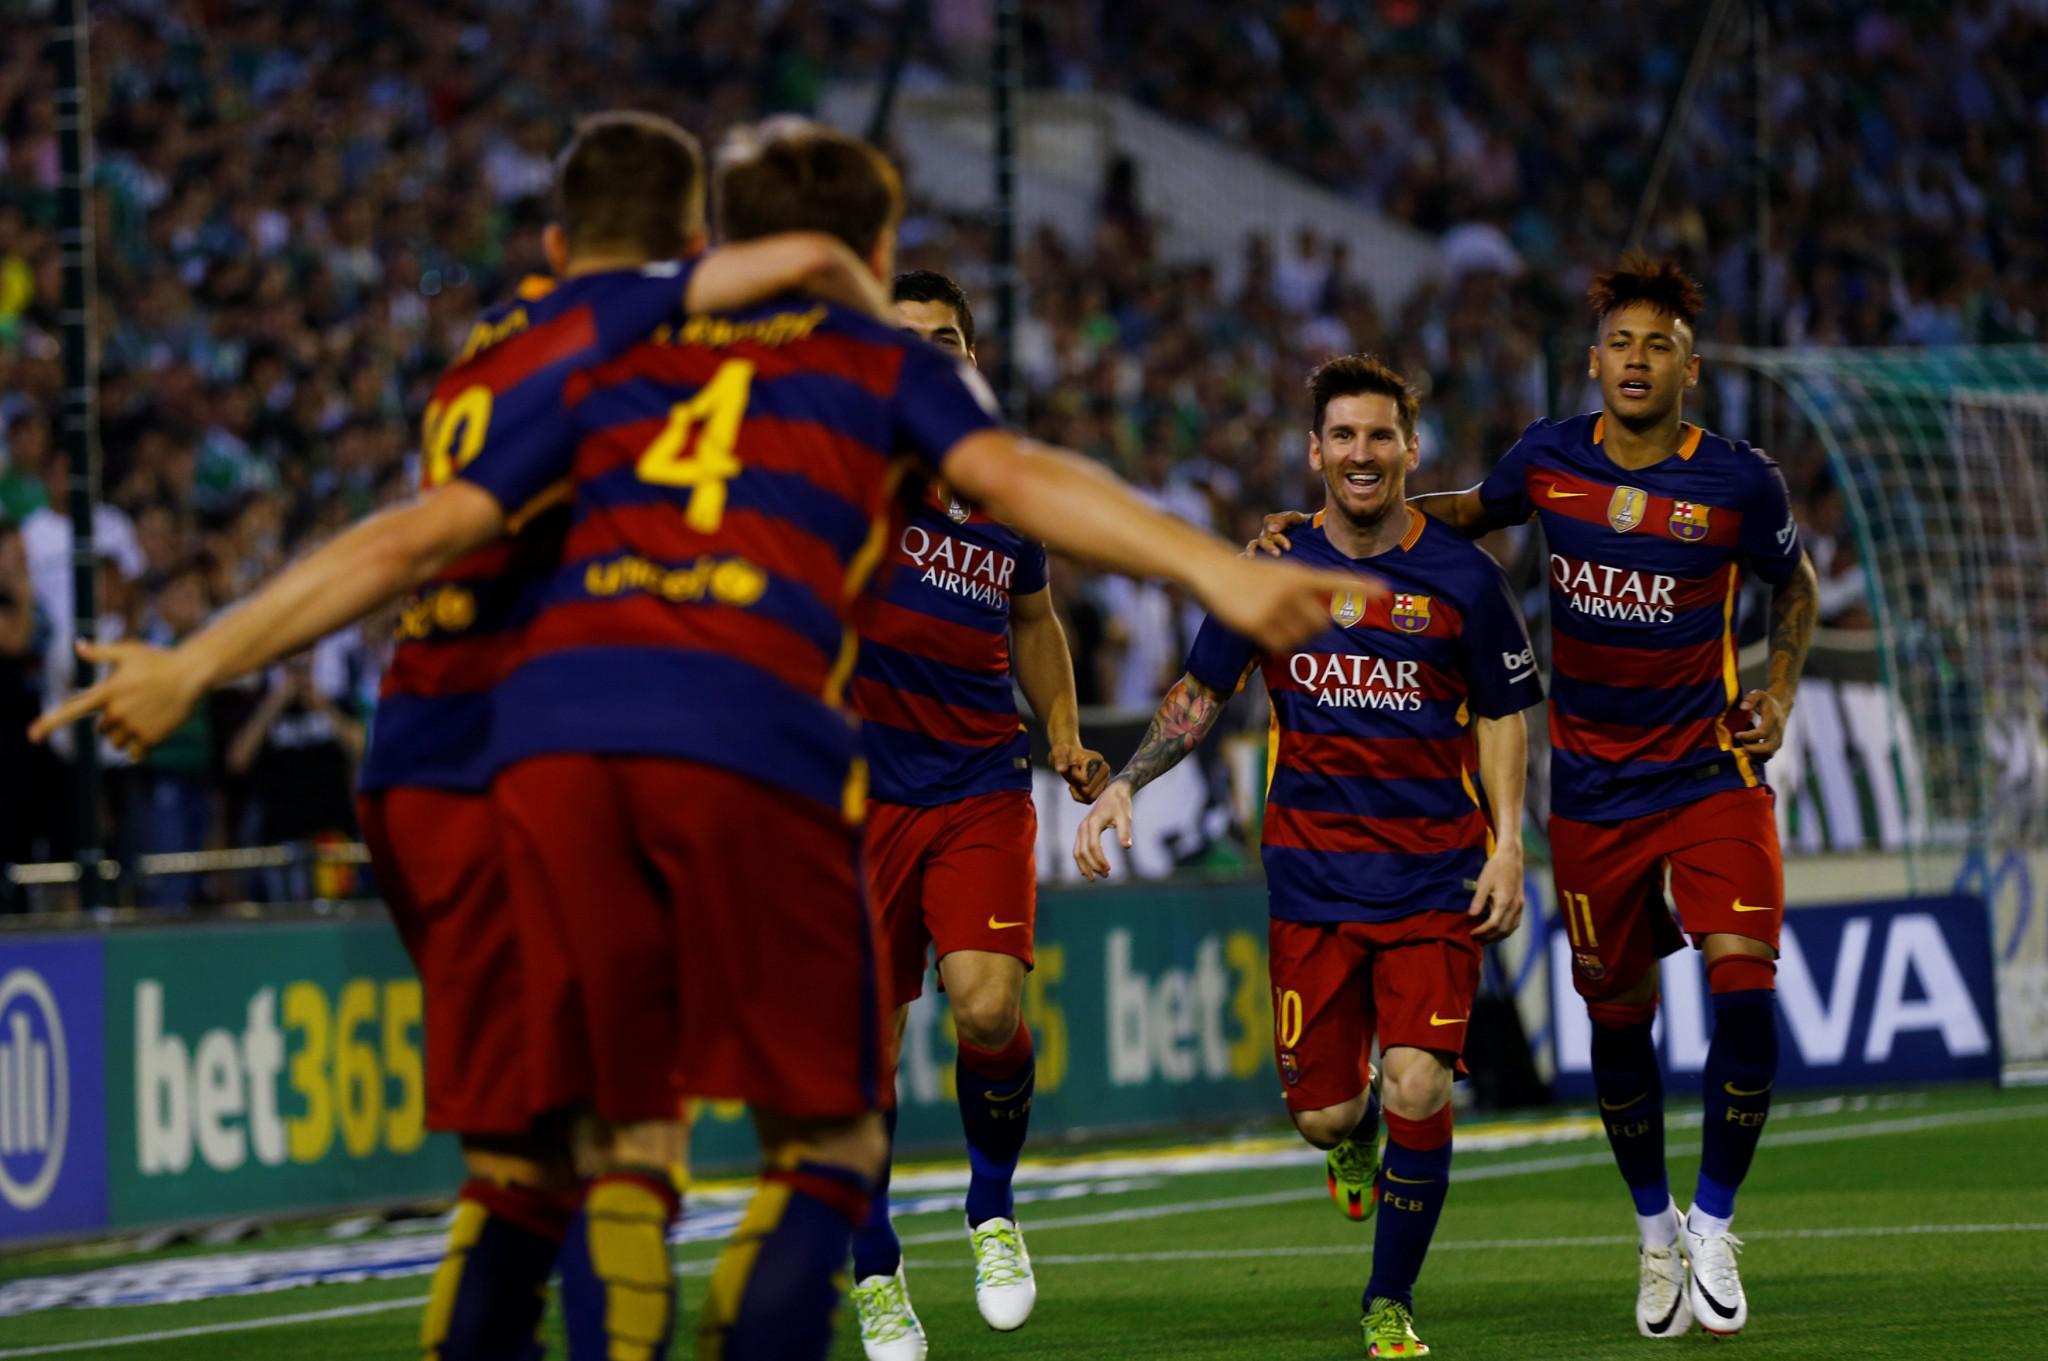 barcelona2-1000 Η μάχη στην κορυφή της Primera Division καλά κρατεί